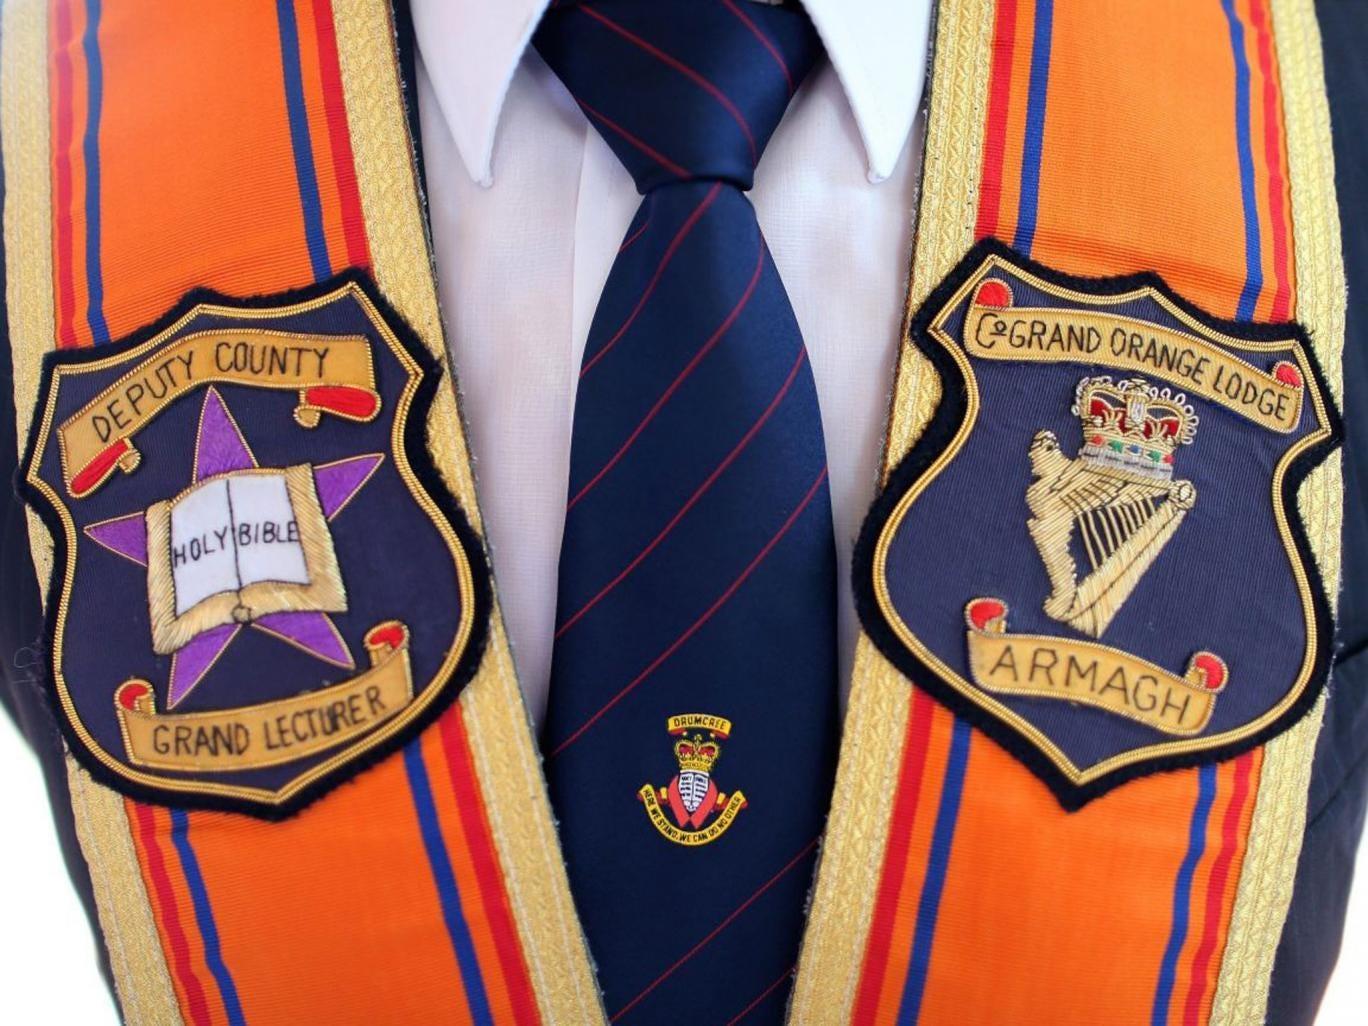 The Collerate of a  Portadown District Loyal Orange Lodge No 1 member in Drumcree